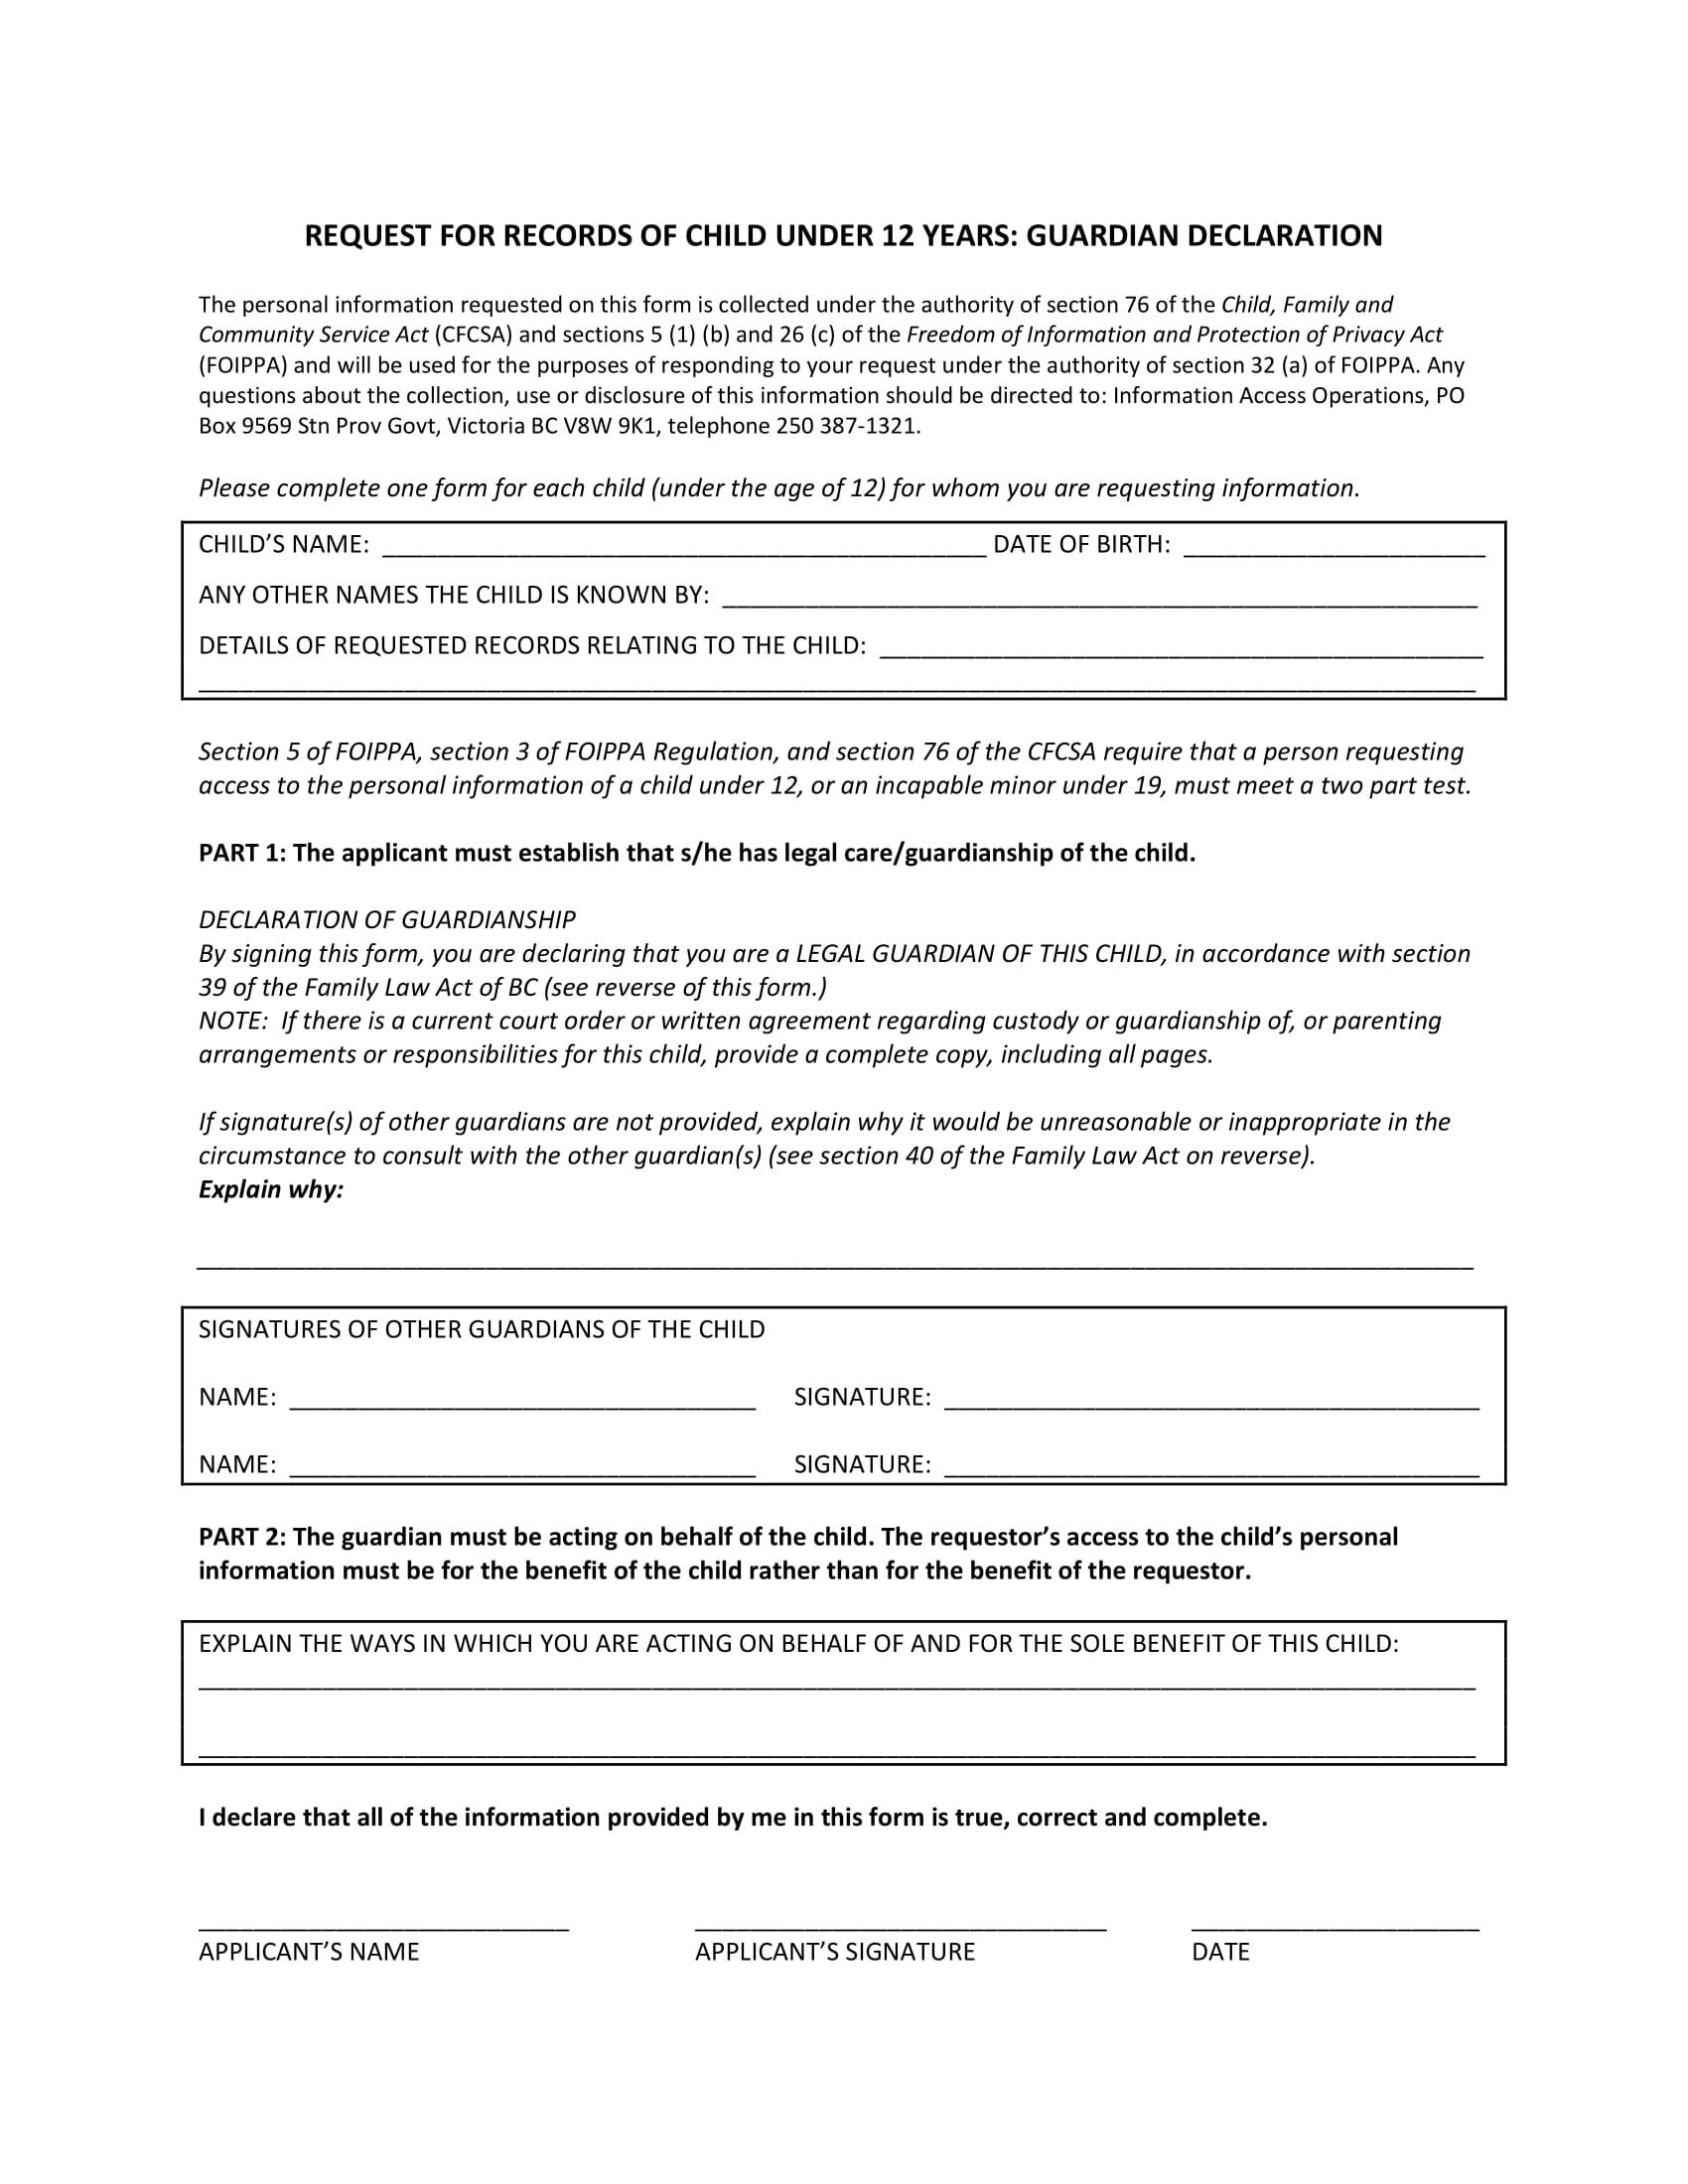 guardian declaration form 1